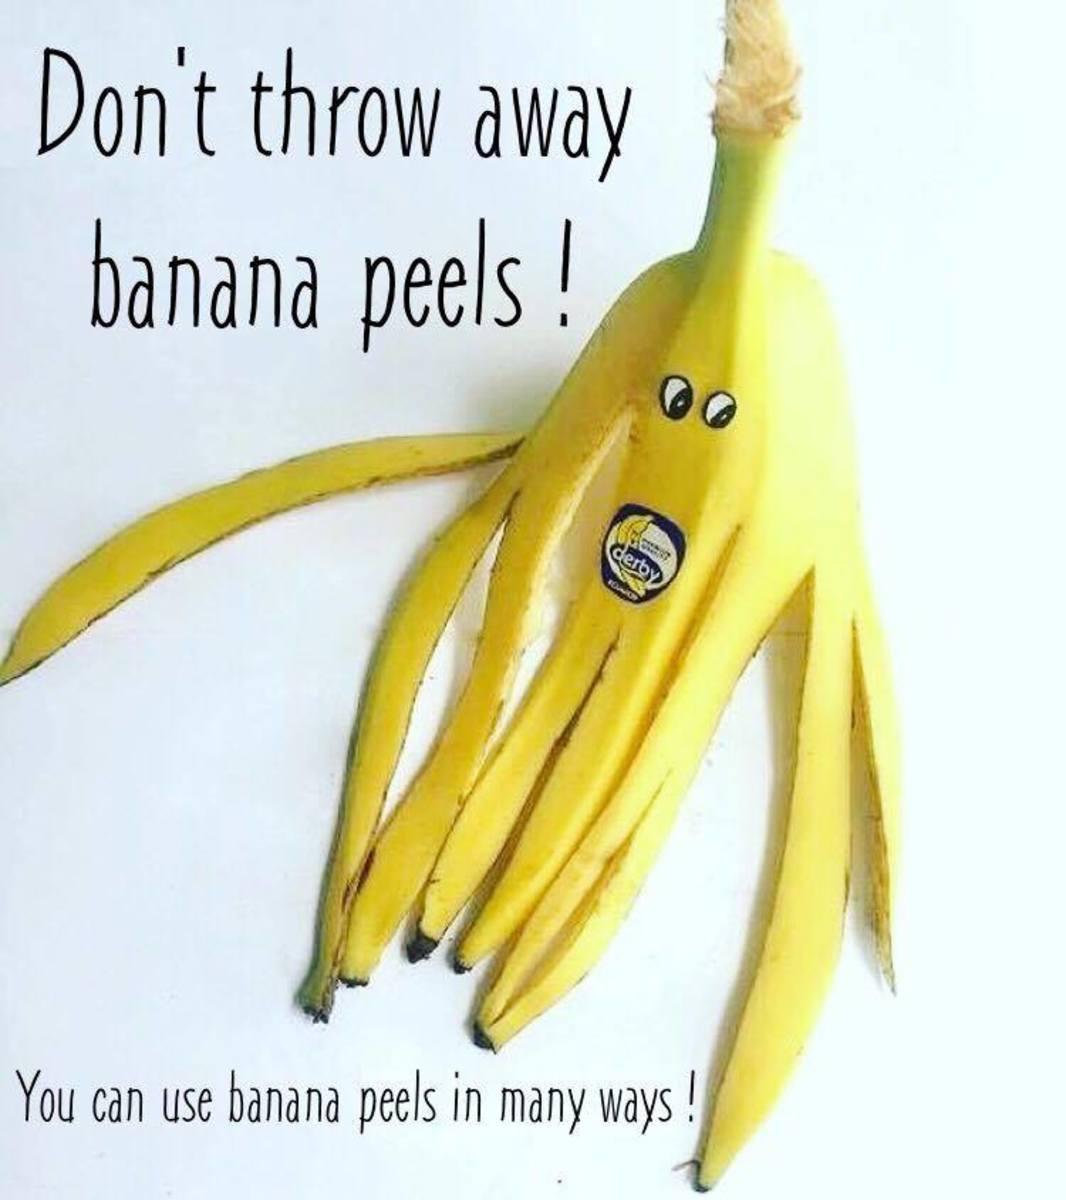 Unusual Uses for Banana Peels